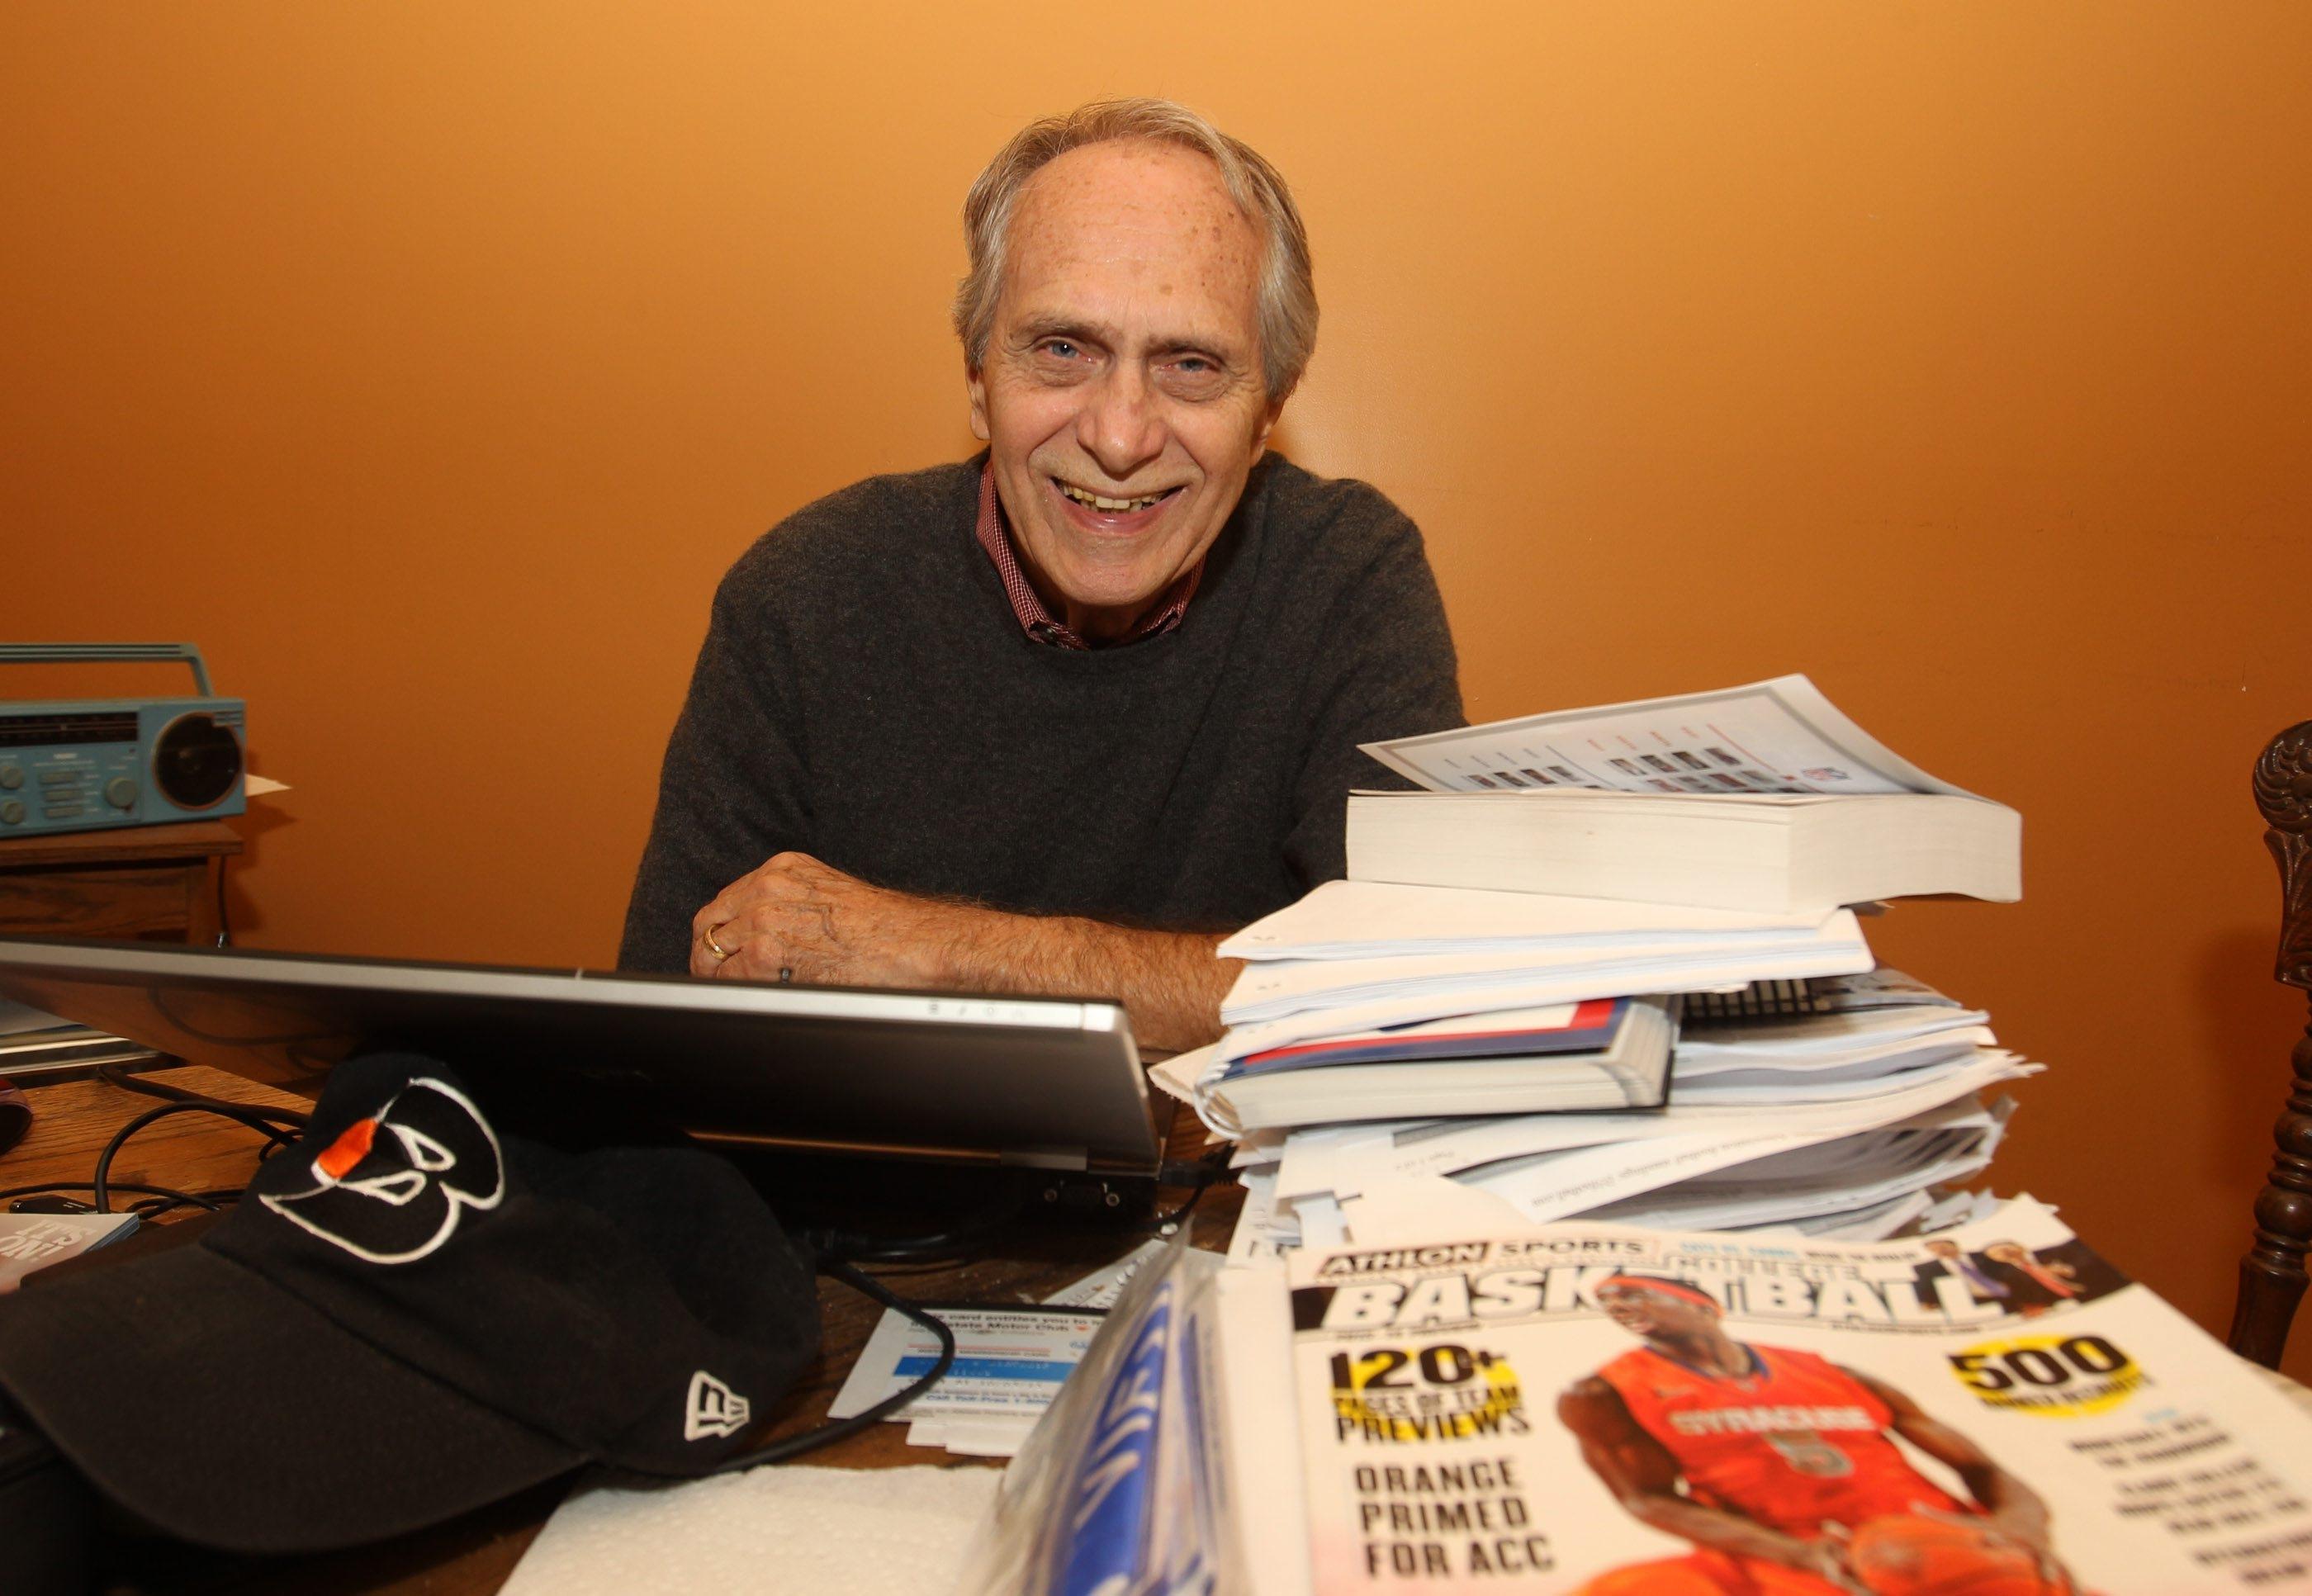 Milt Northrop has been in Buffalo for 46 years.